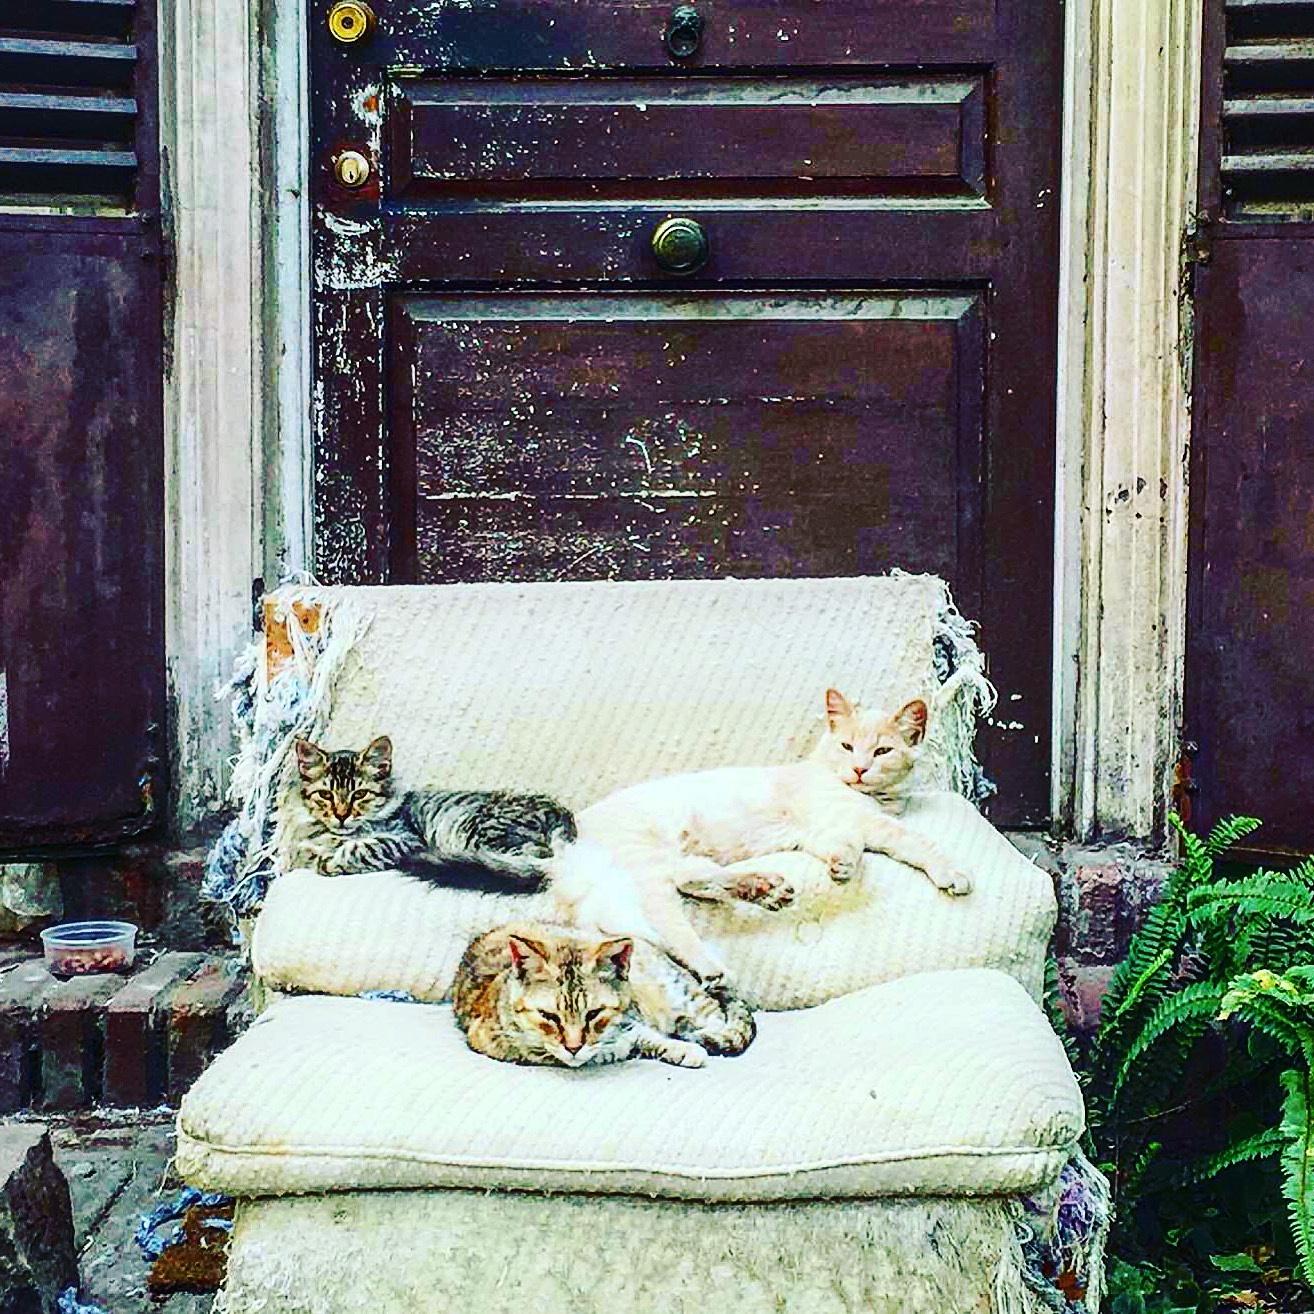 Cats by gabriela goñi